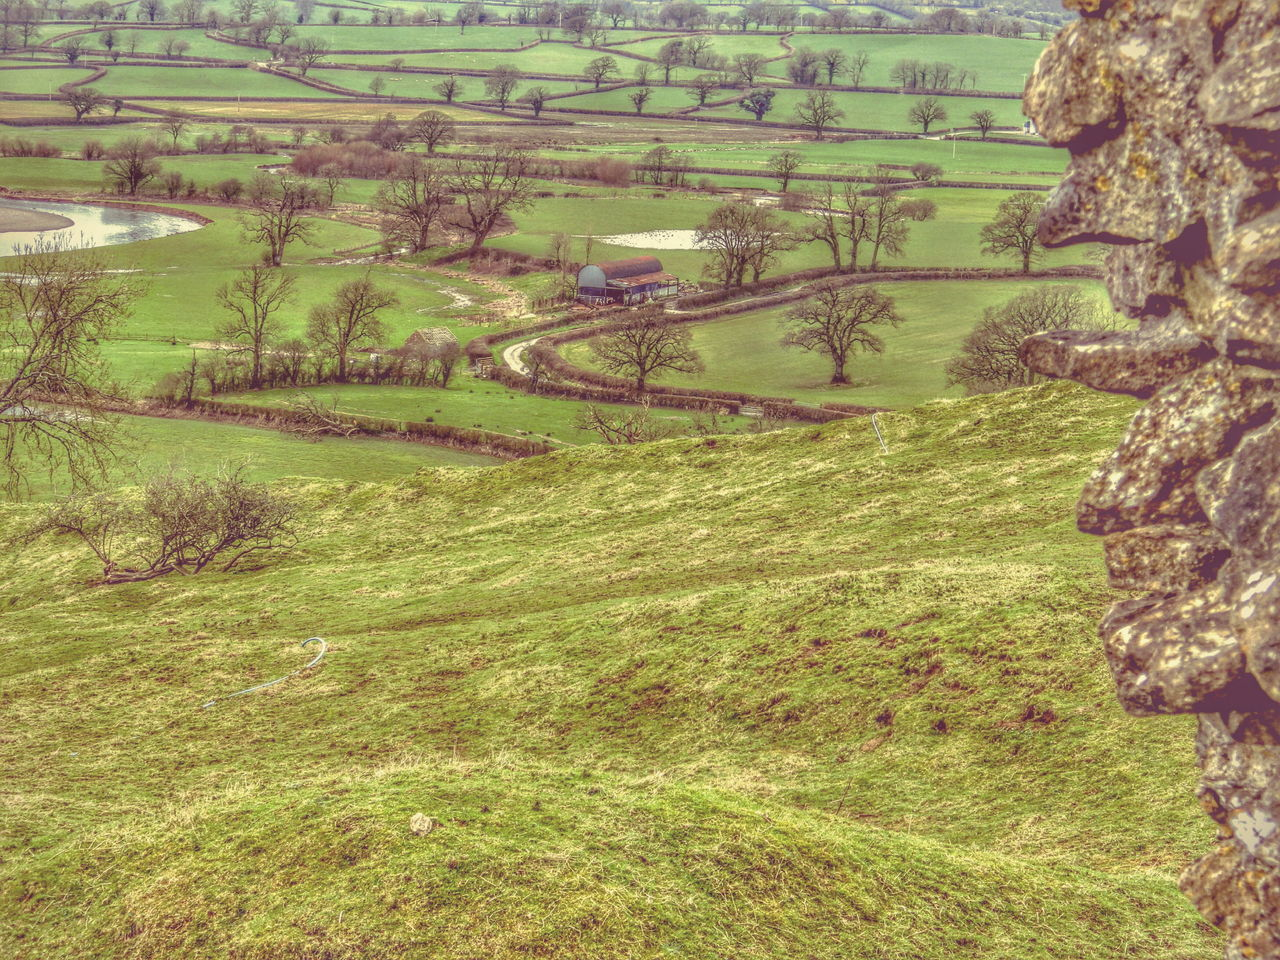 Wales Green Patchwork Rock Farm Barn Valley Rural Bucolic